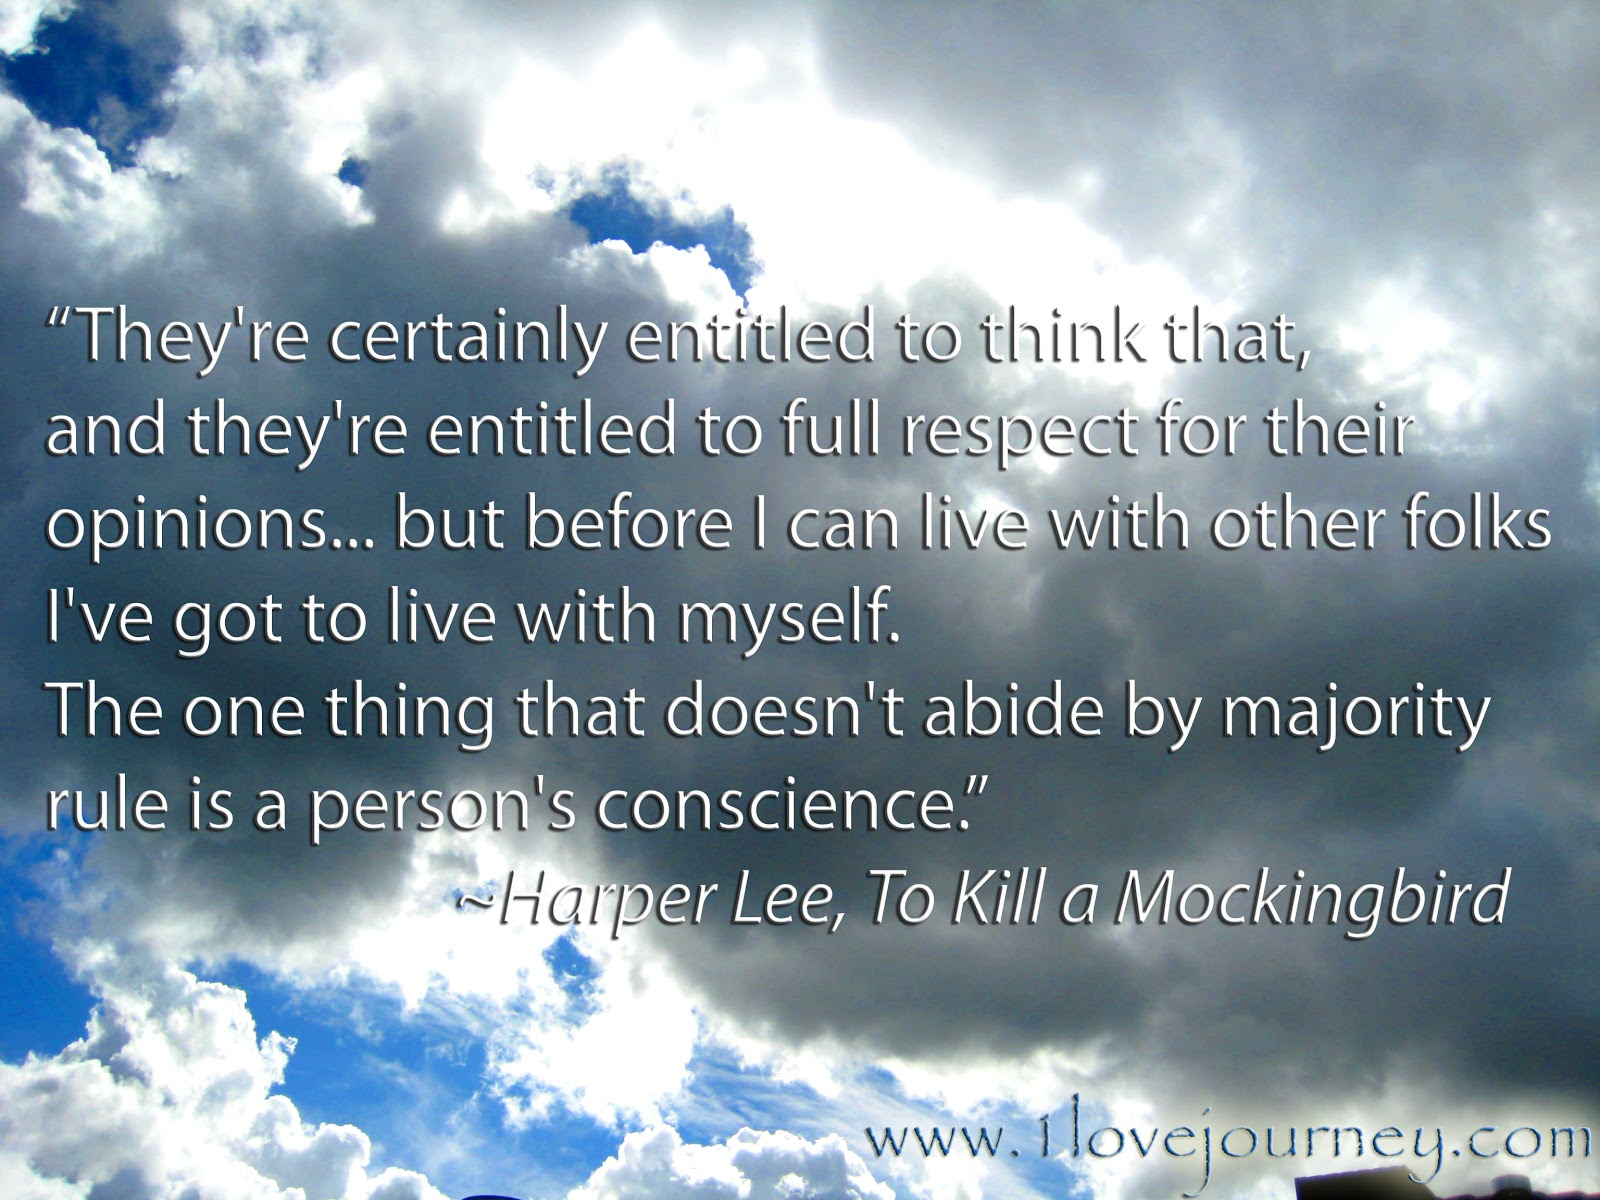 to kill a mockingbird atticus courage essay